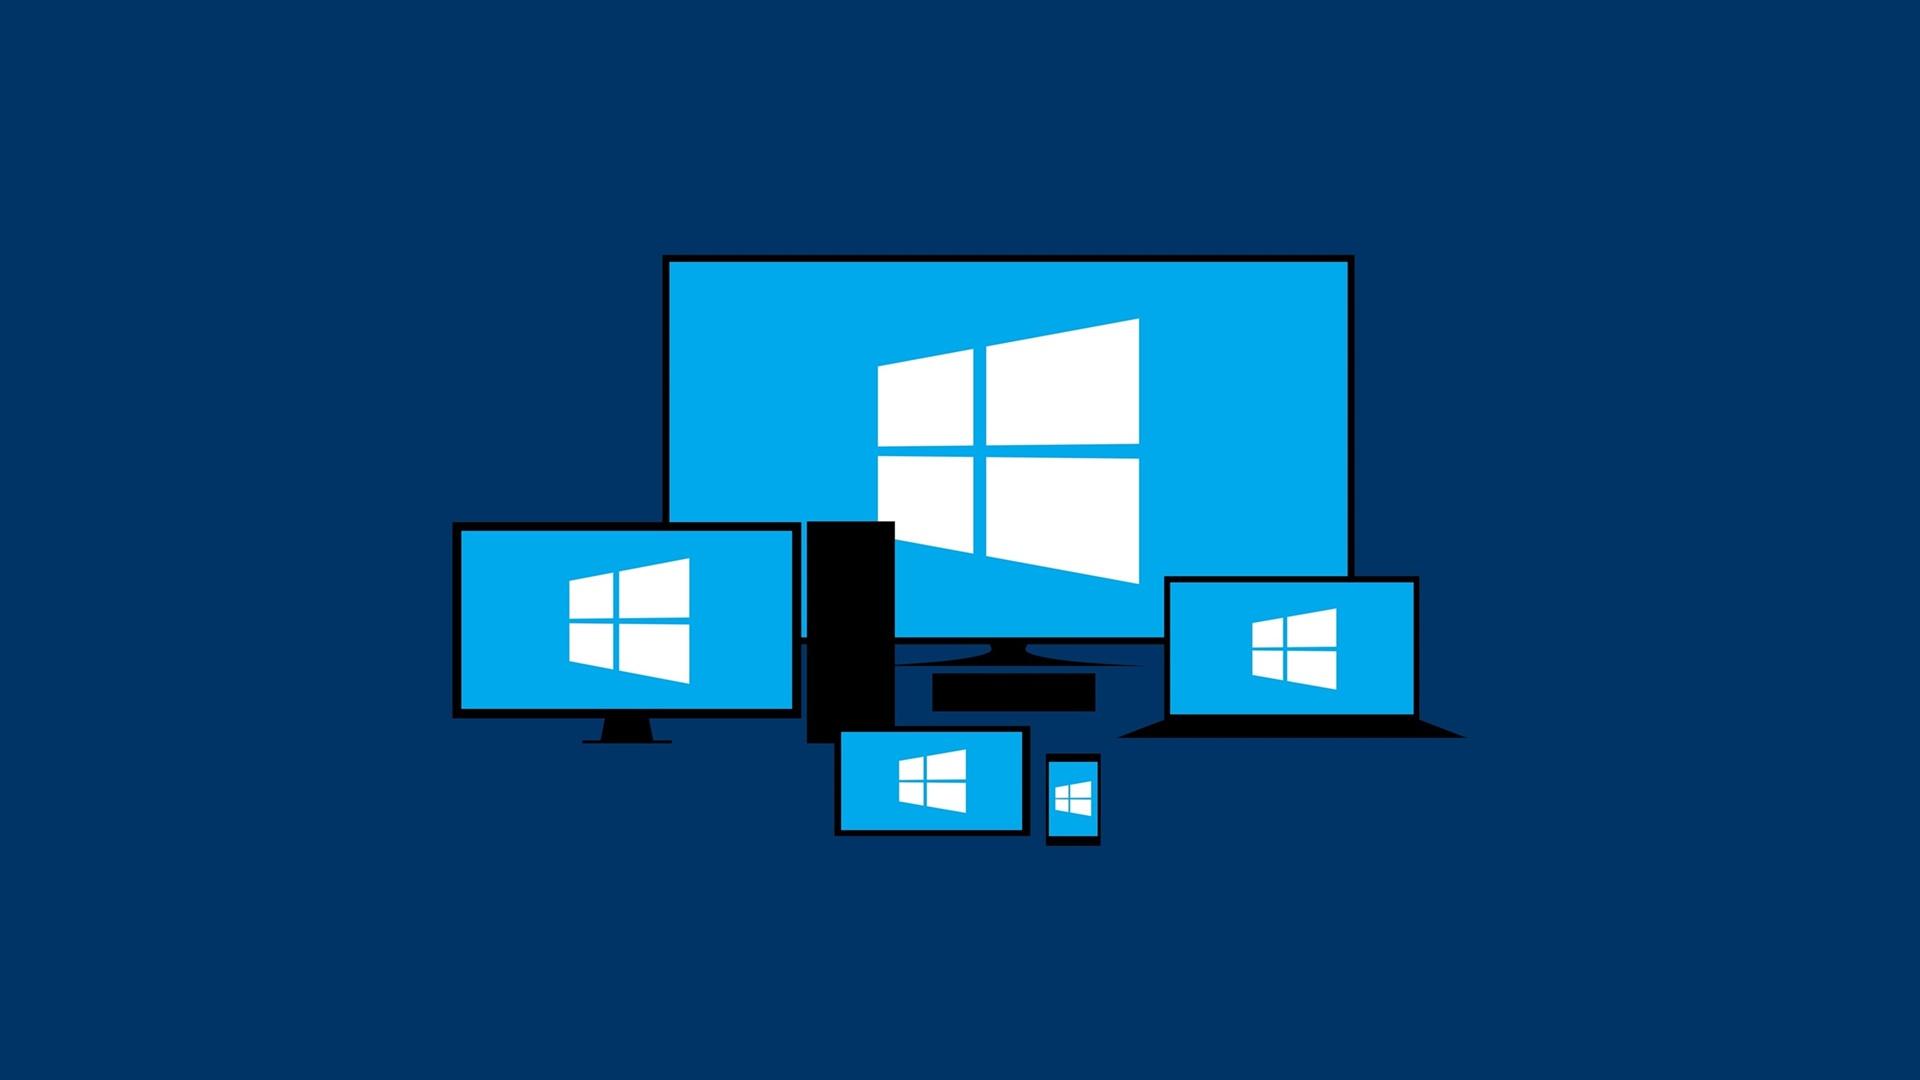 windows_10_wallpaper_pack_by_roddiow-d8176s3